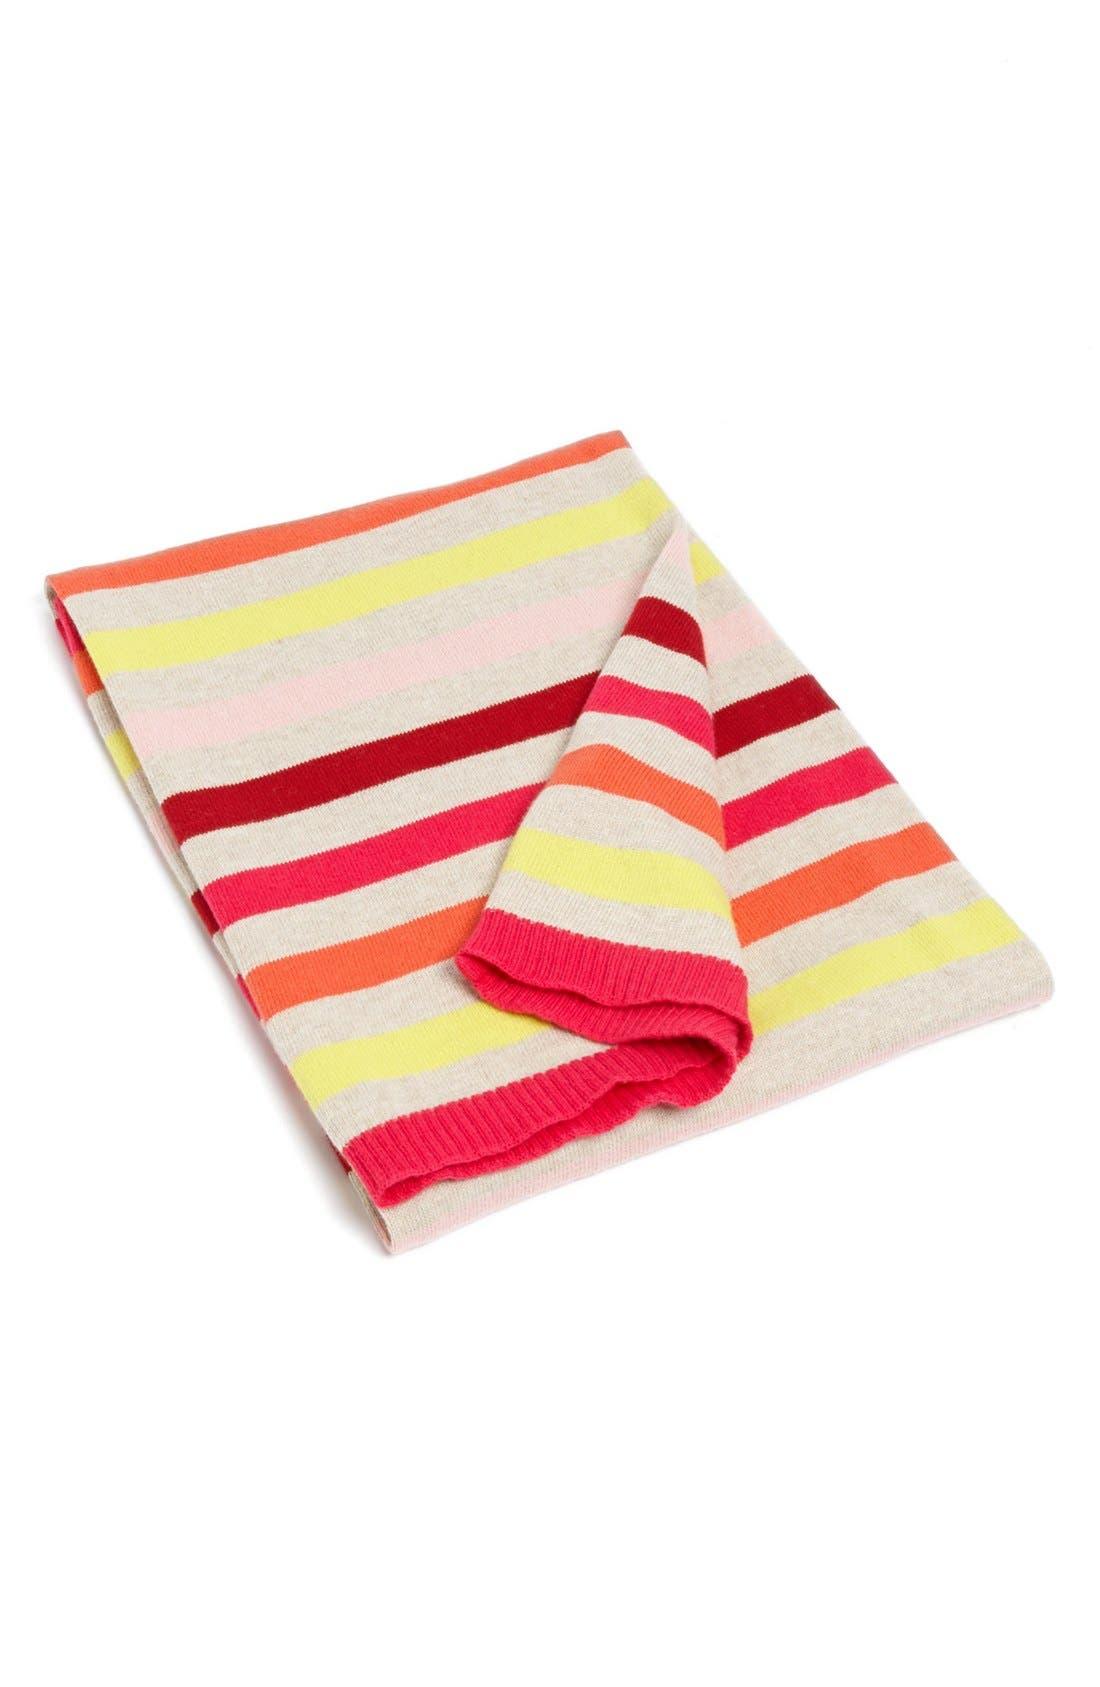 Main Image - Tucker + Tate Striped Cotton & Cashmere Blanket